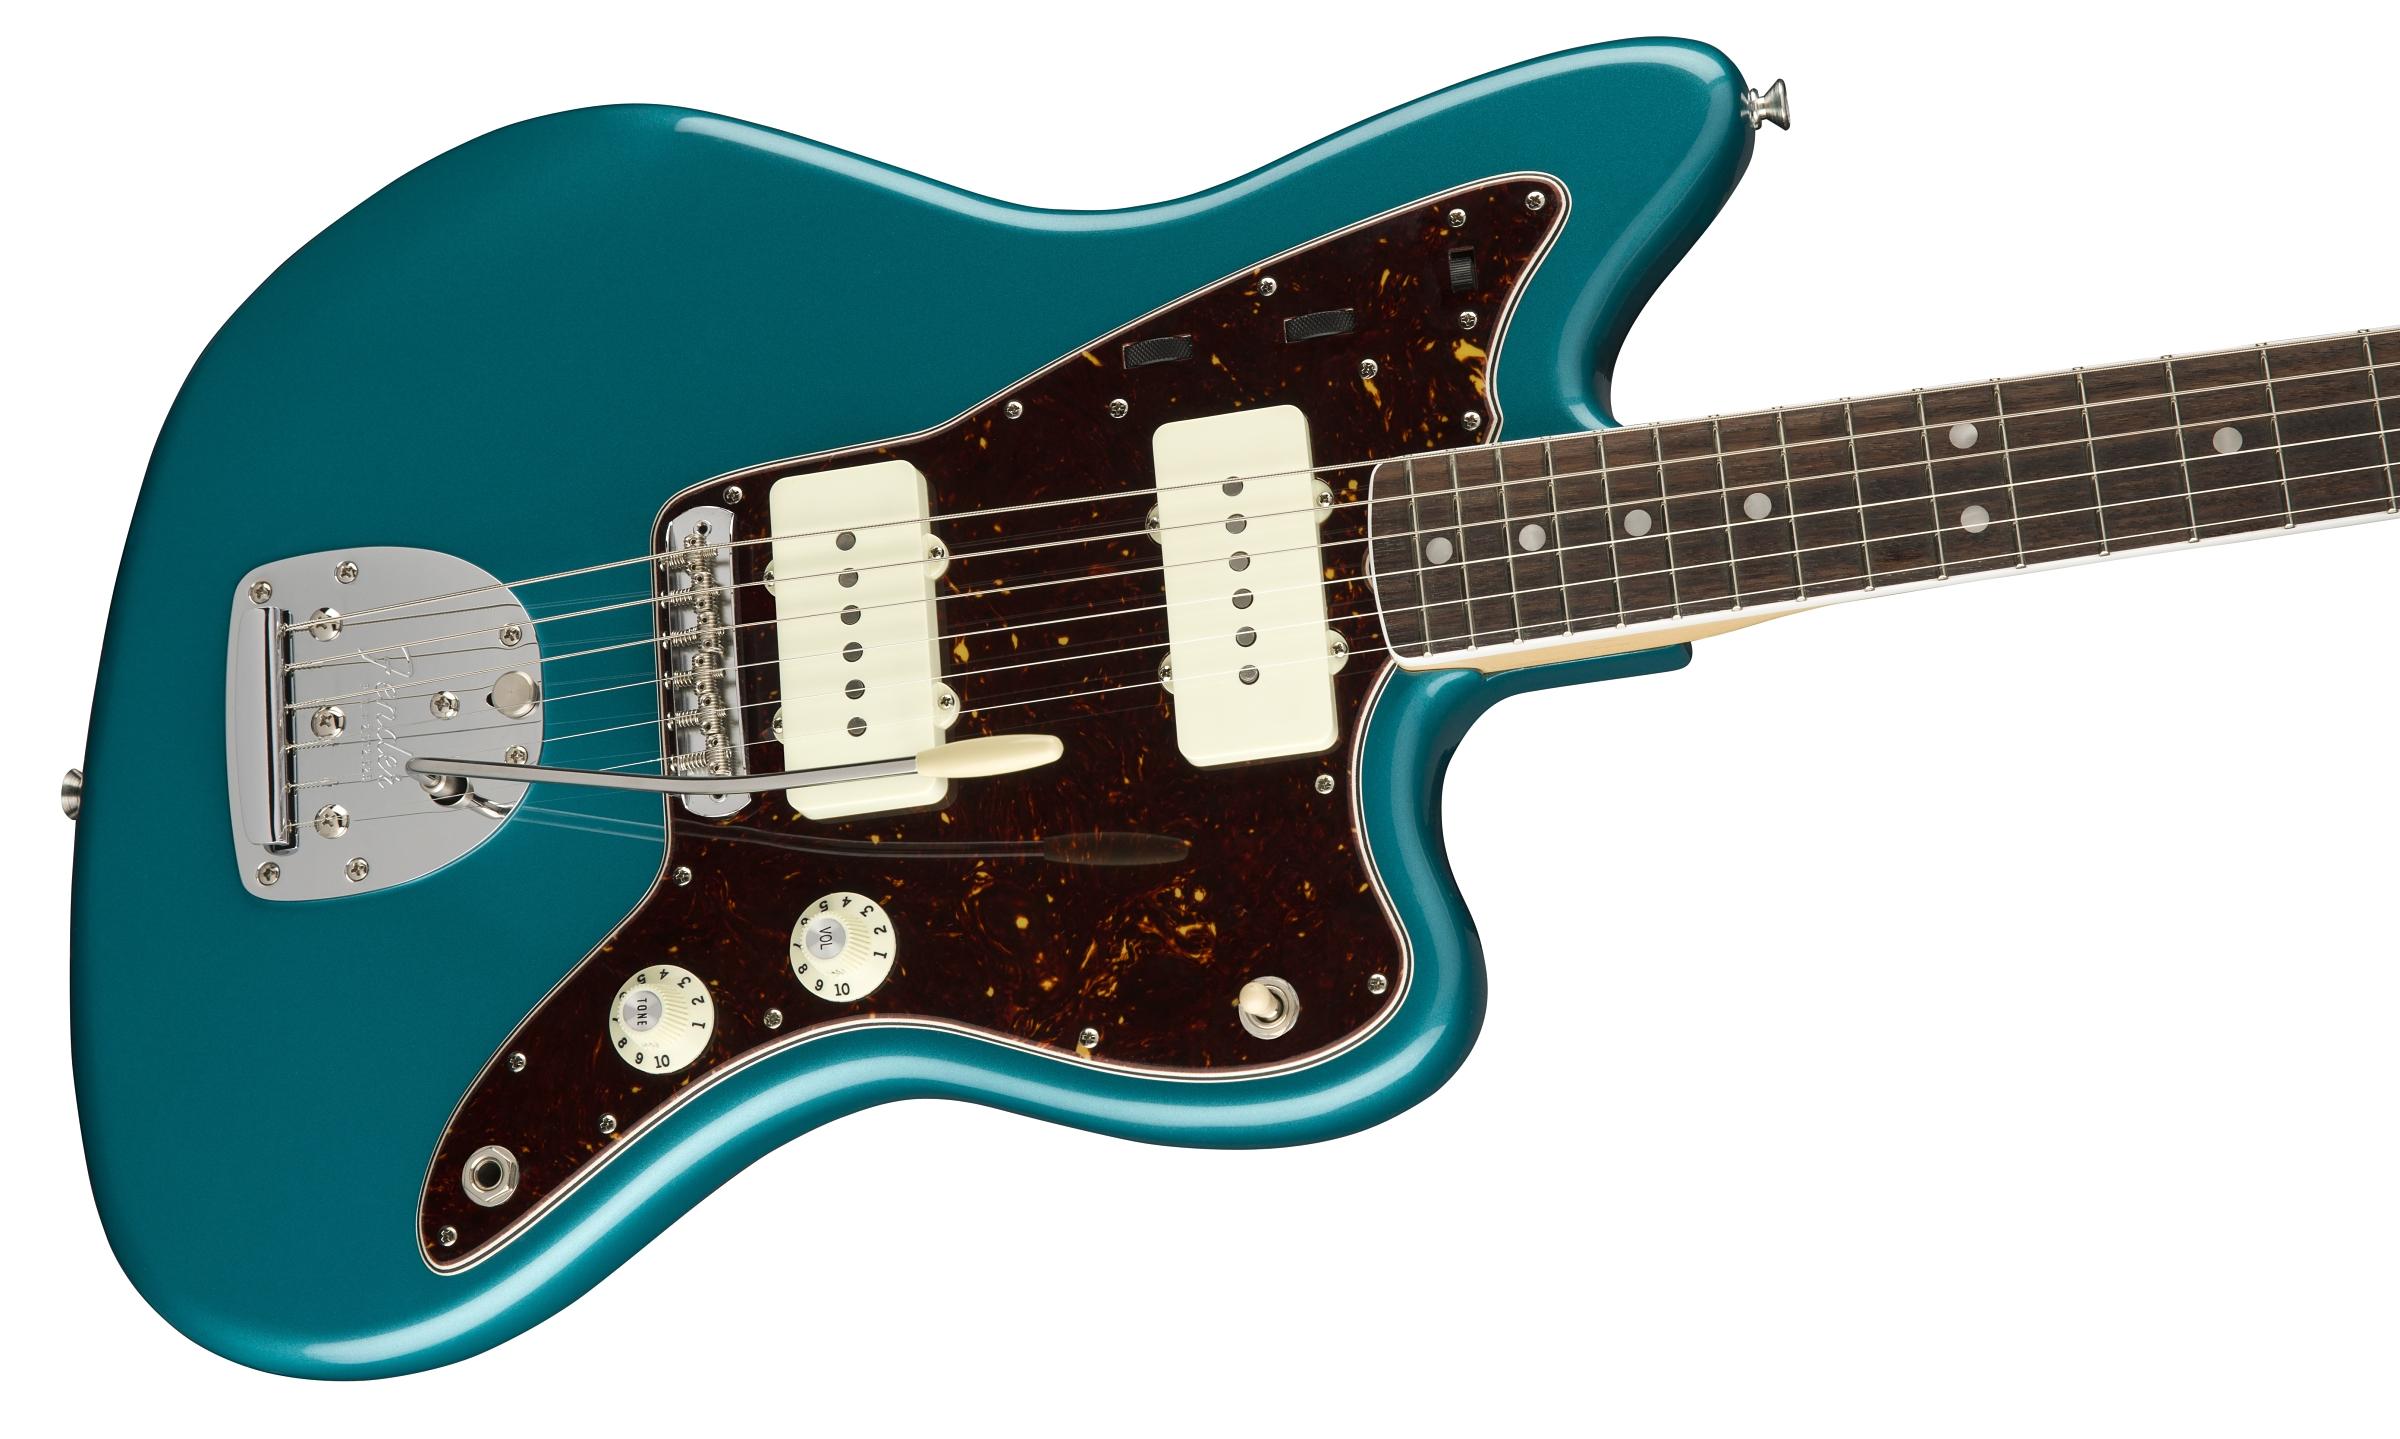 American Original 60s Jazzmaster Electric Guitars Series Wiring Diagram Tap To Expand